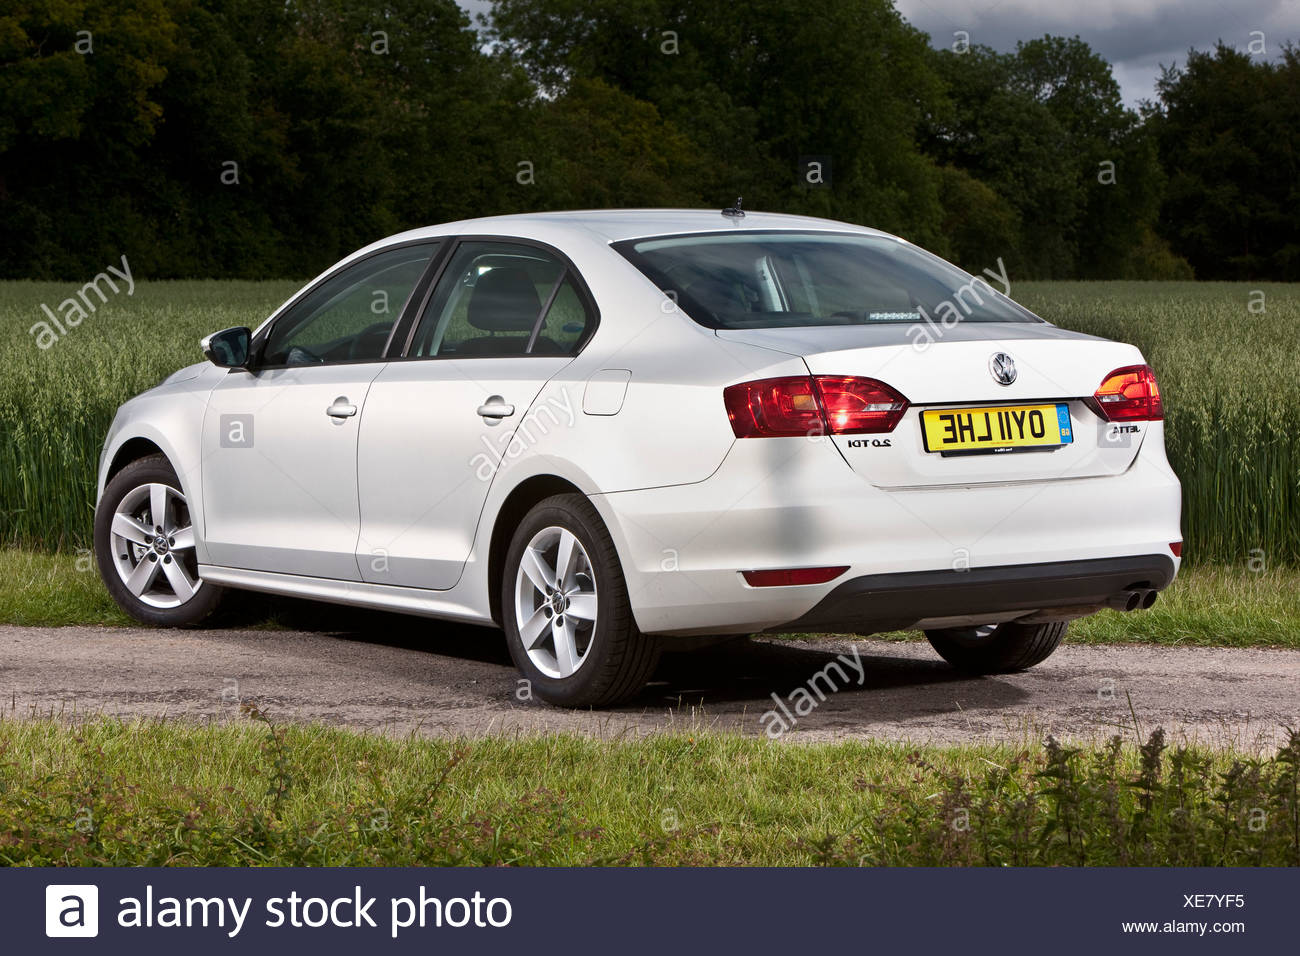 VW Jetta mid sized German Passenger Car in rural Southampton, UK 13 6 2011 - Stock Image